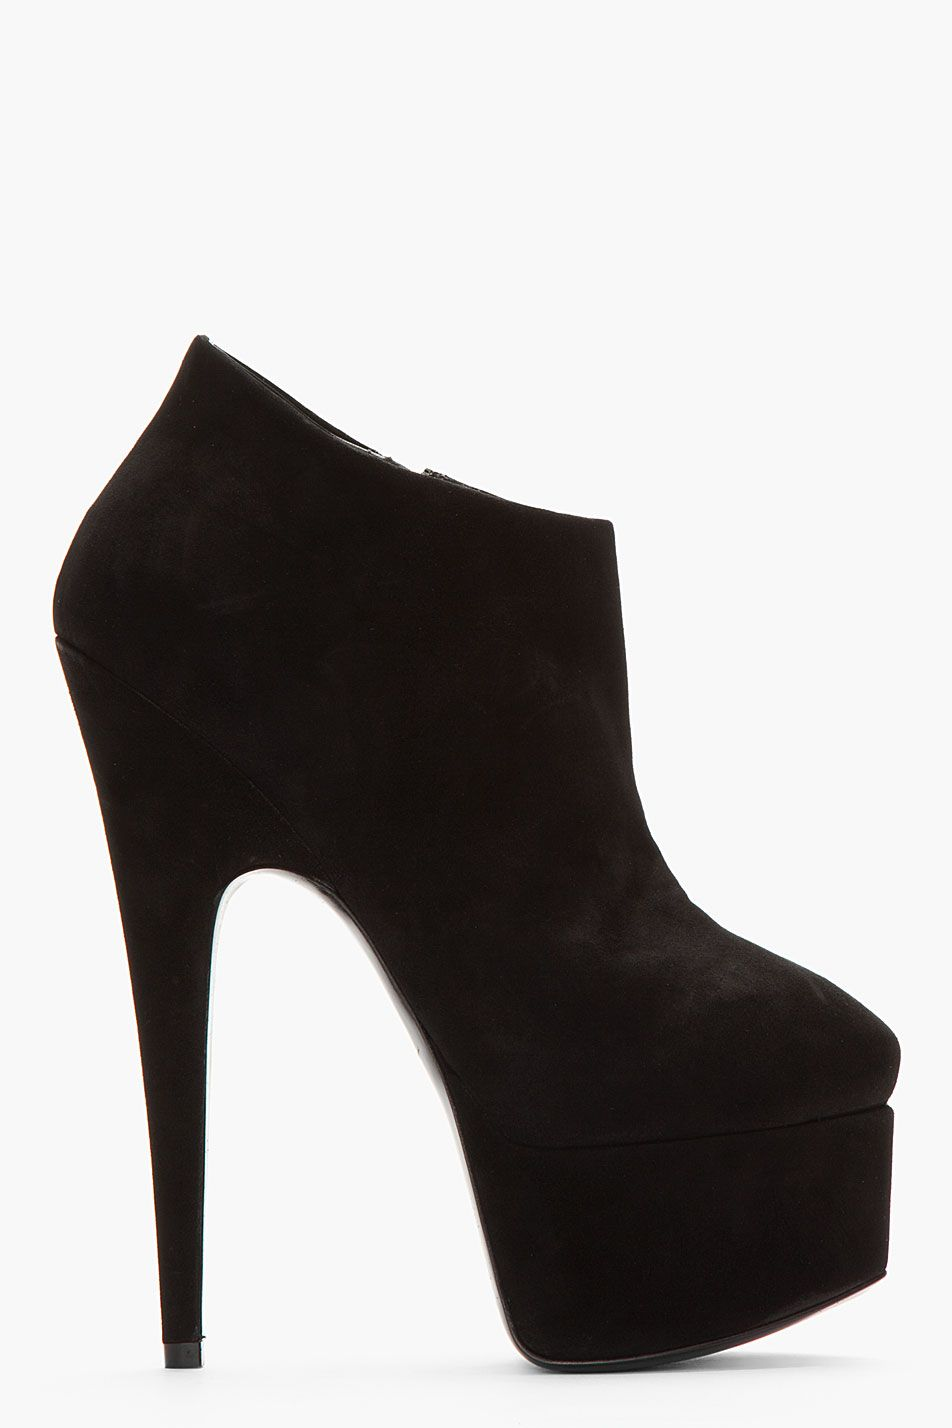 GIUSEPPE ZANOTTI Black Suede Ankle high pumps